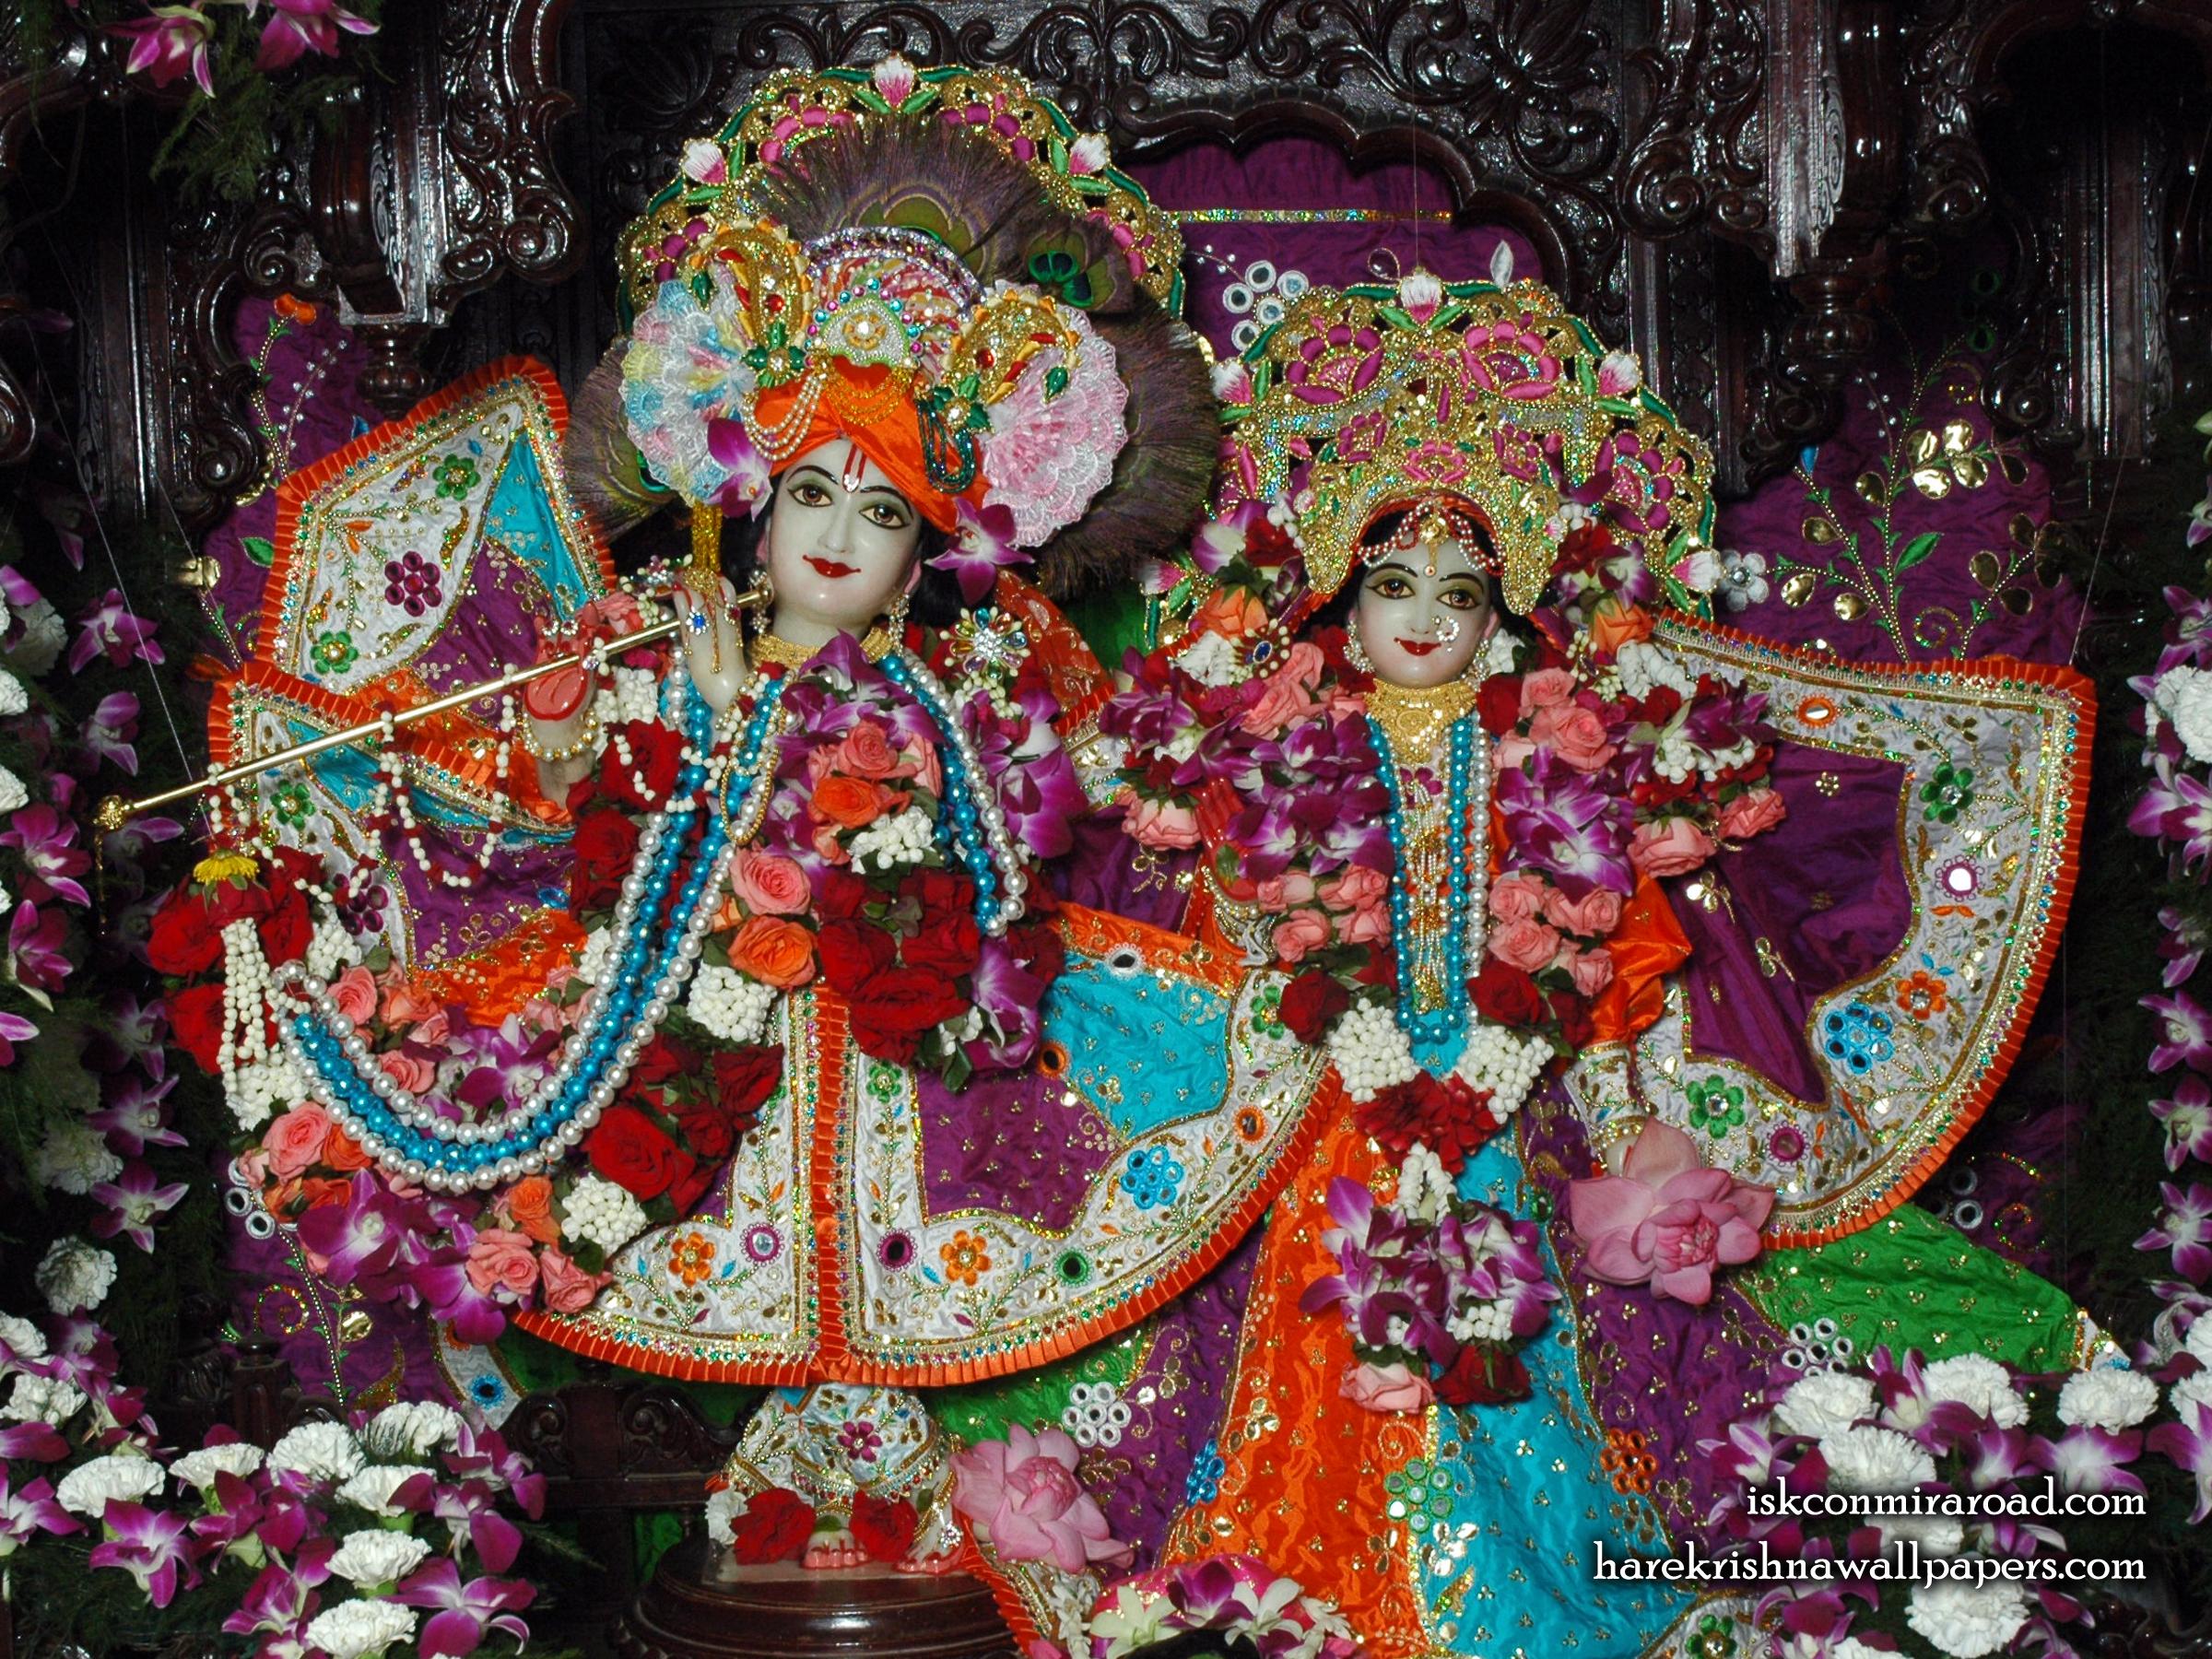 Sri Sri Radha Giridhari Wallpaper (016) Size 2400x1800 Download